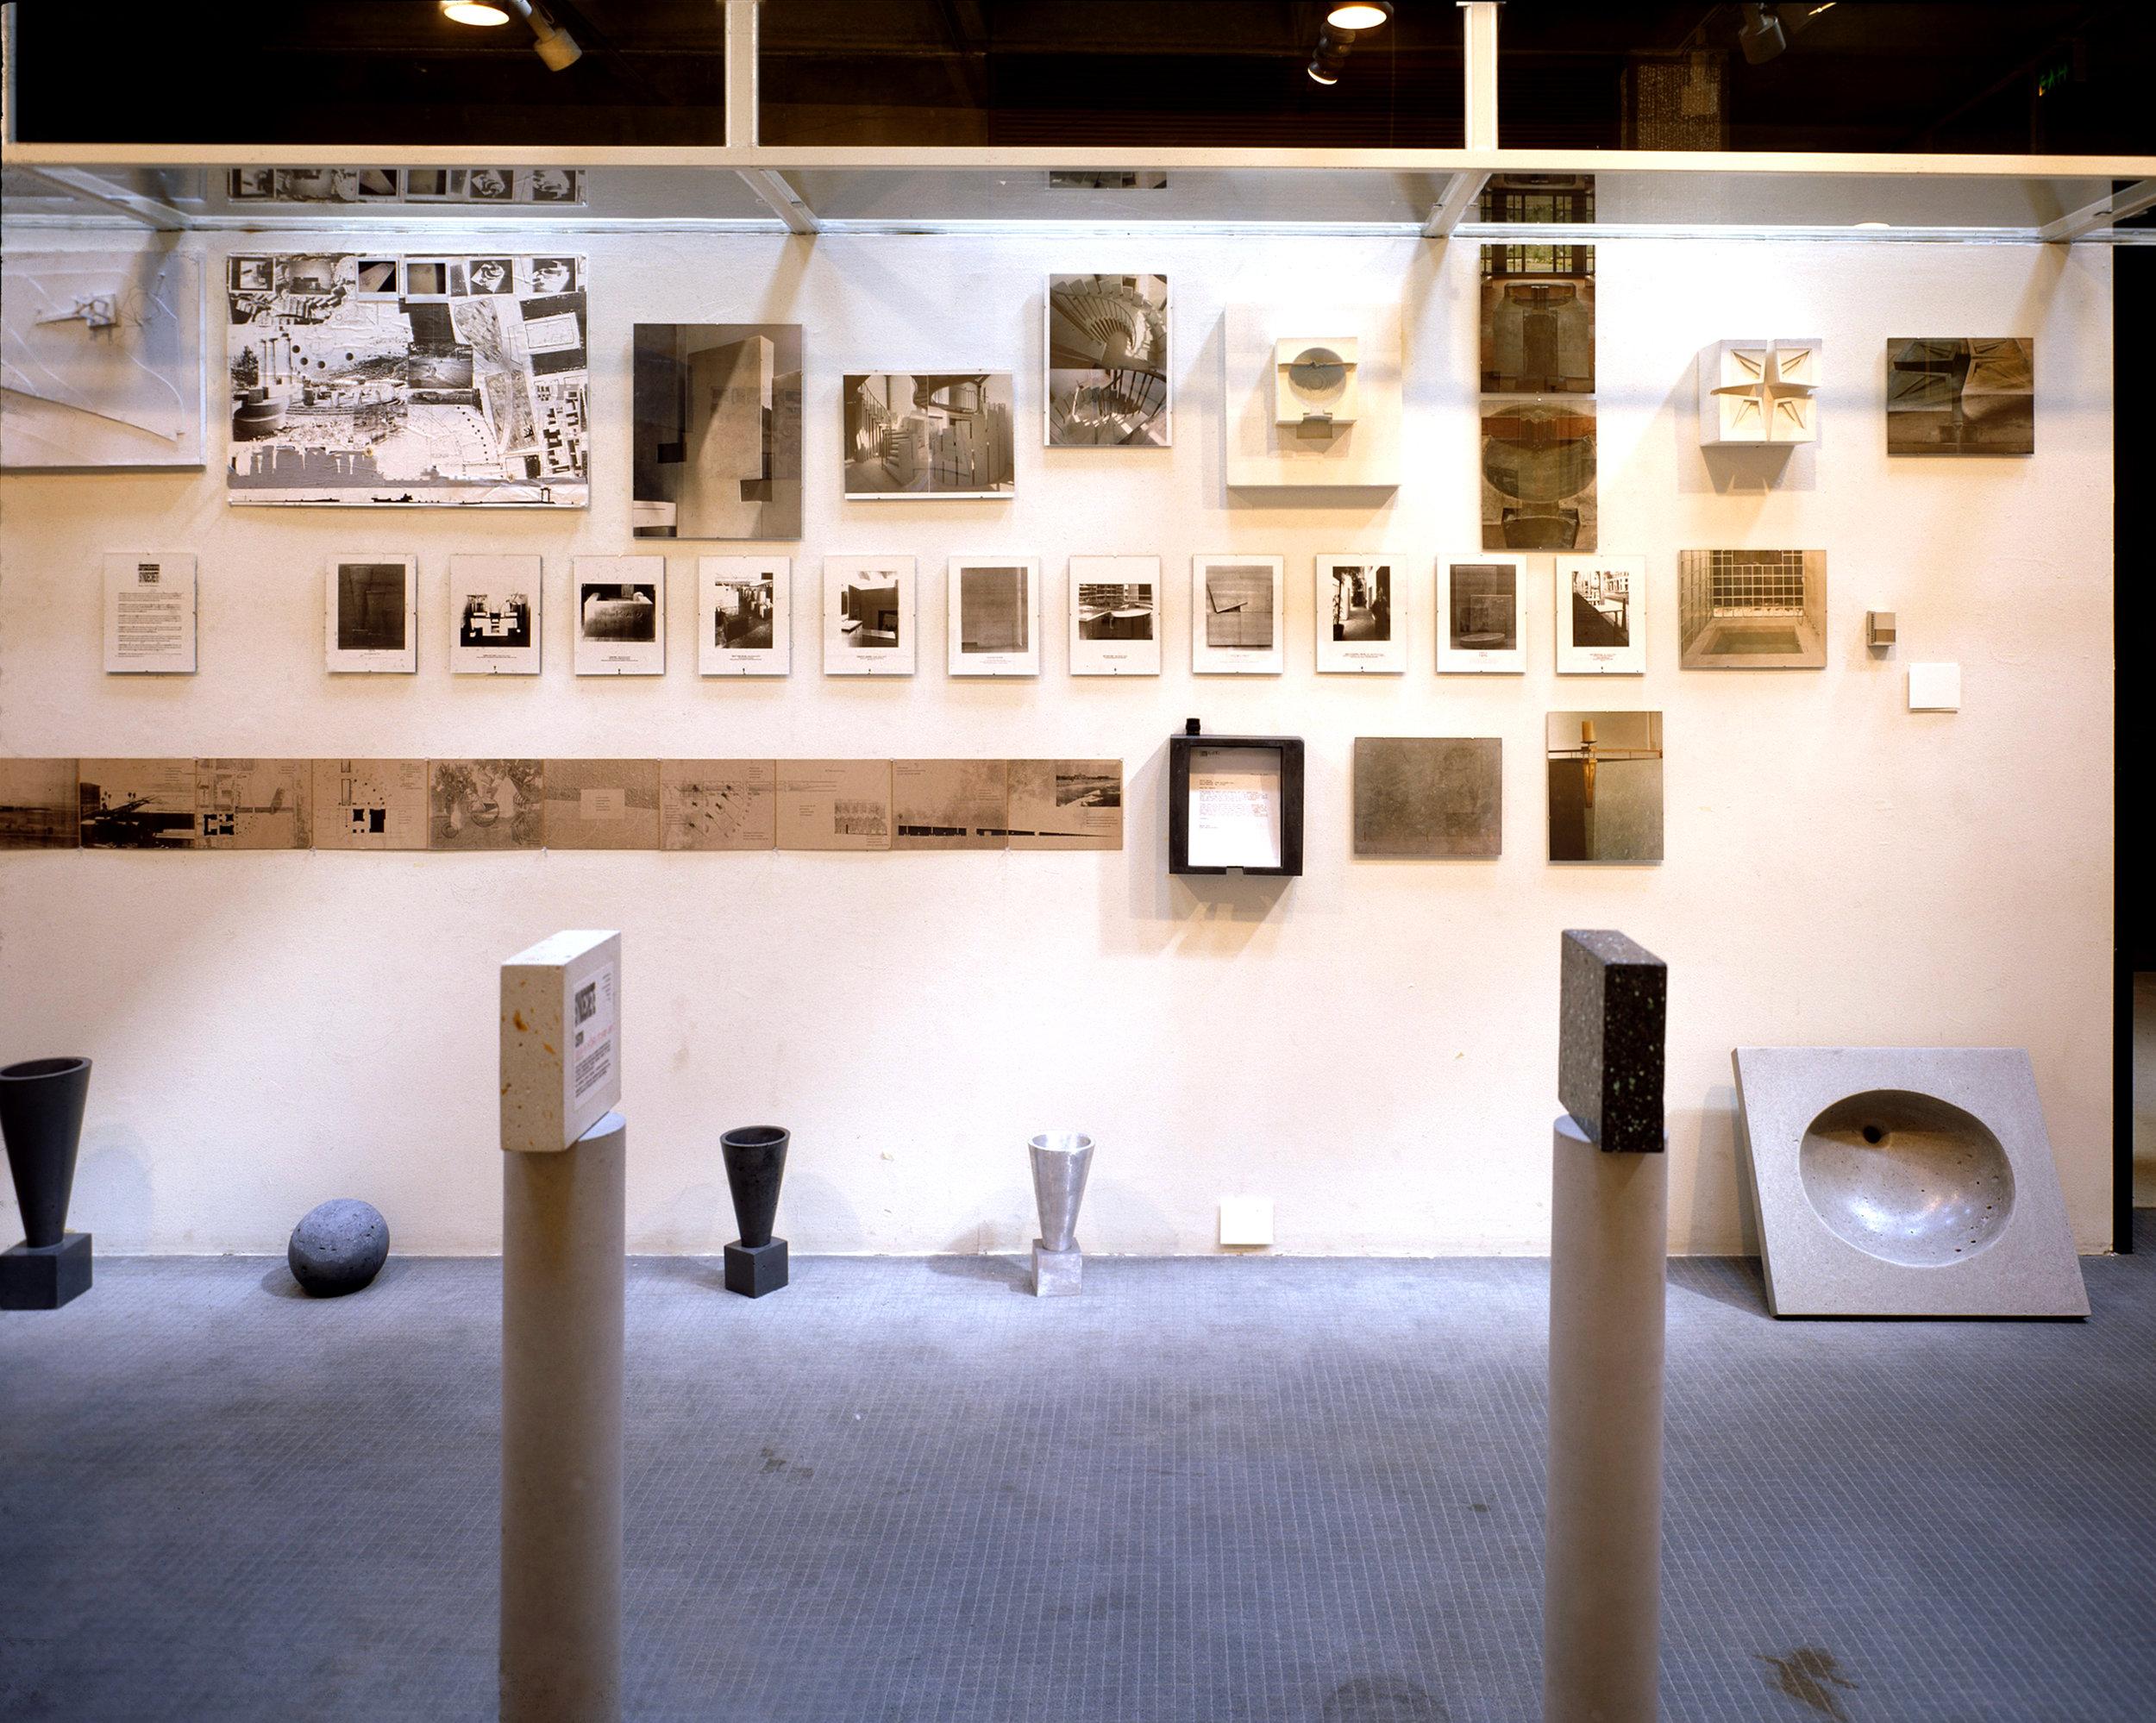 S.E.A.-Studio-Environmental-Architecture-David-Hertz-FAIA-Syndecrete-Venice-Beach-California-sustainable-regenerative-restorative-green-design-Syndesis-reclaimed-recycled-building-material-unique-construction-concrete-brutalism-invention-flooring-7.jpg